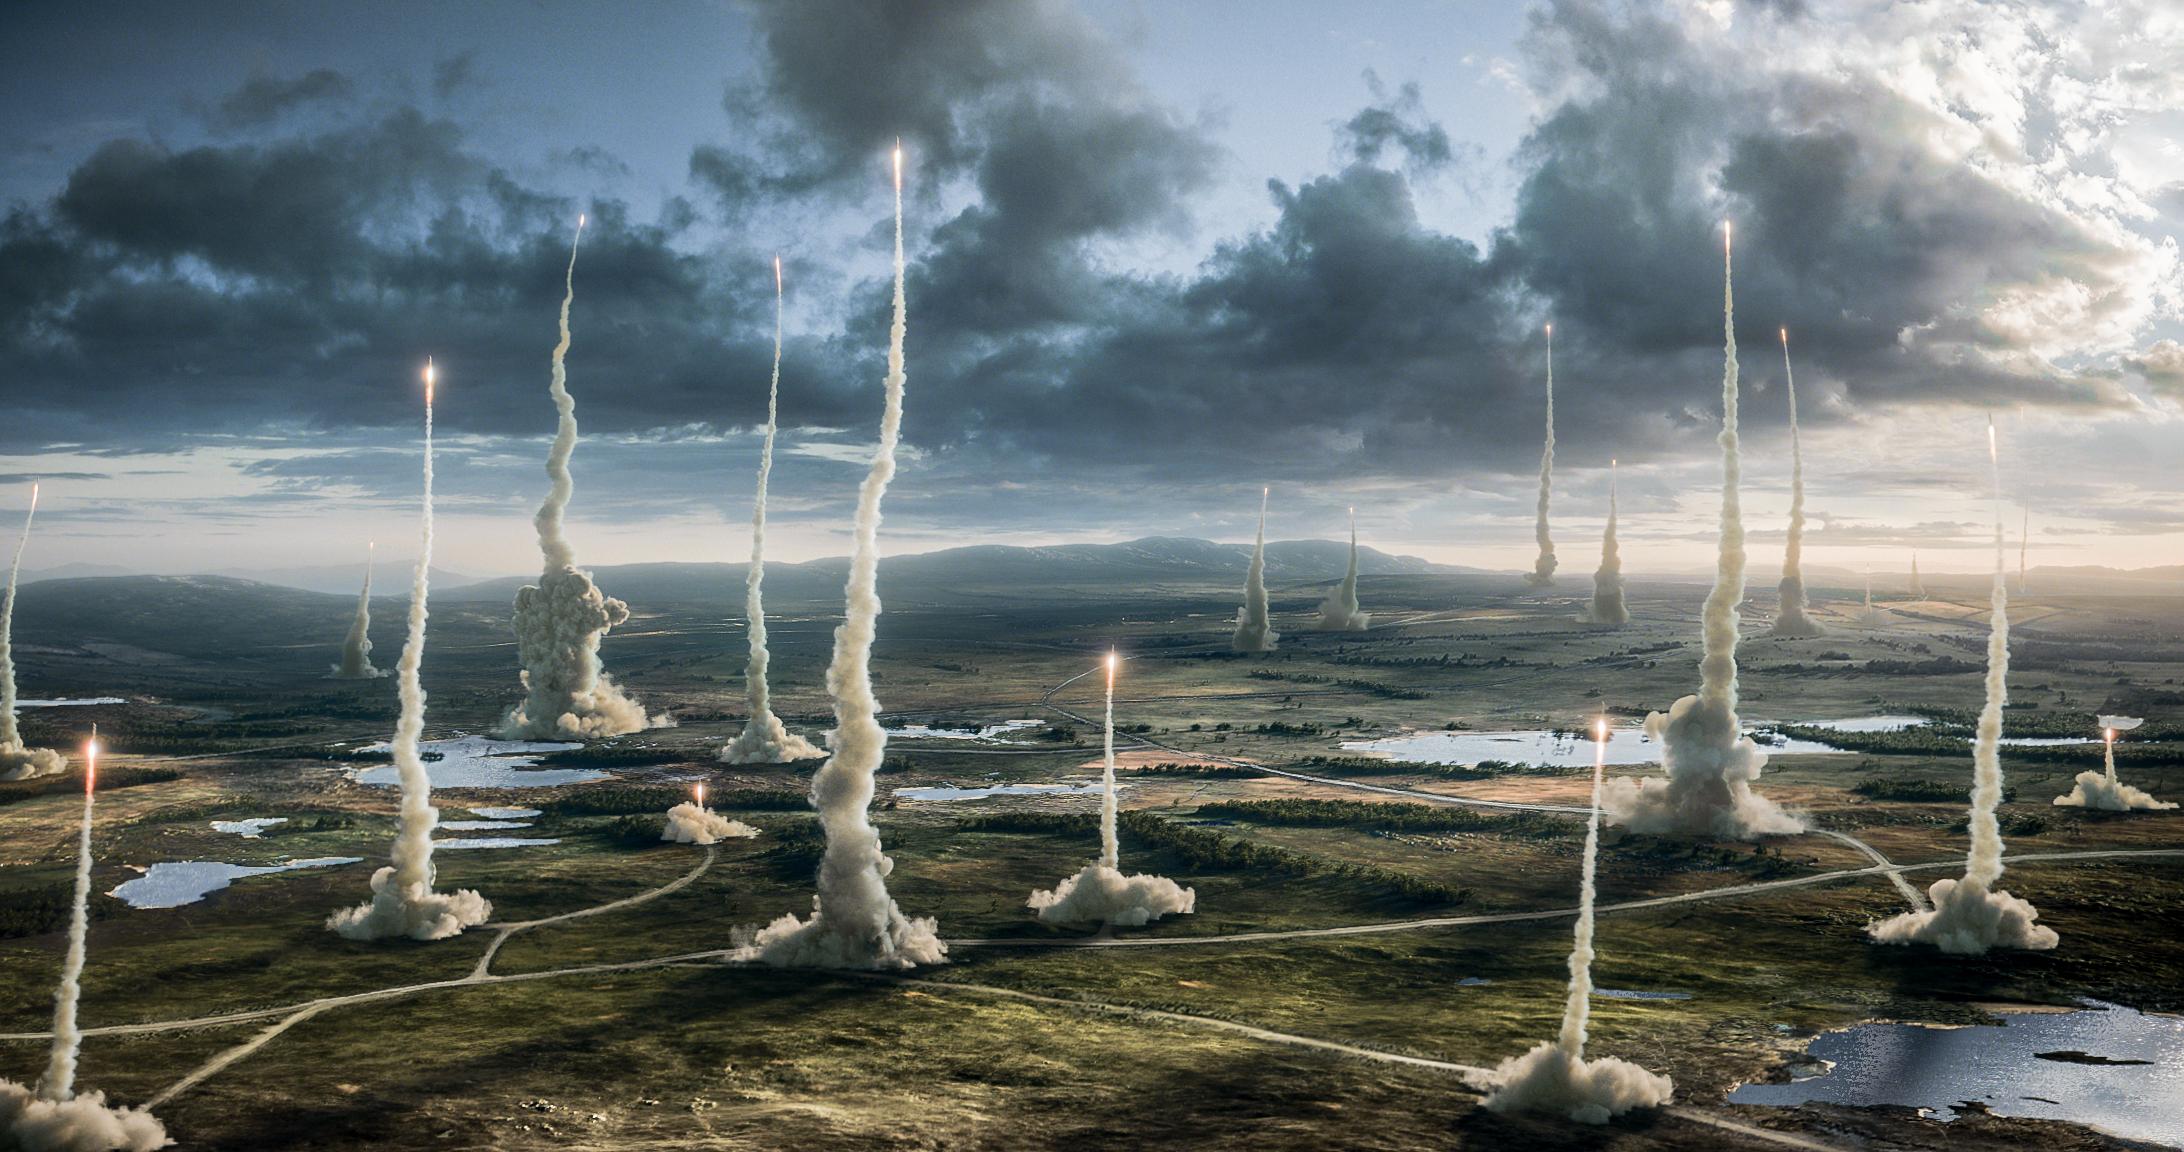 x-men-apocalypse-image.jpg